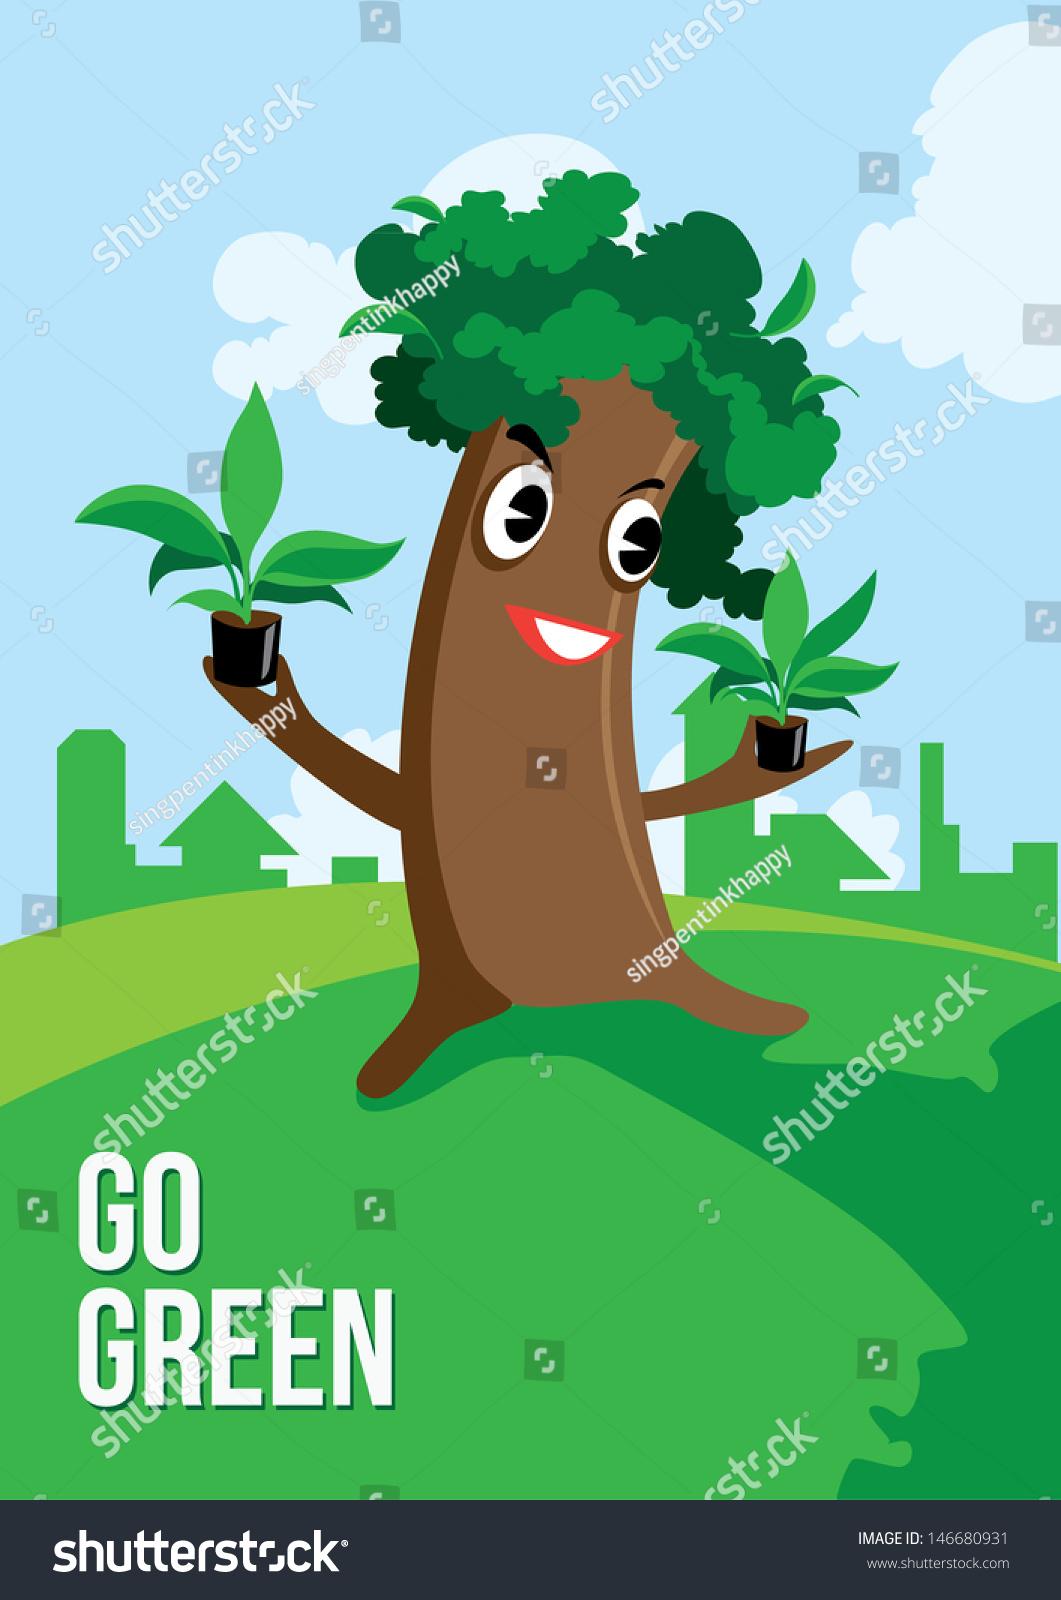 Go Green Cartoon Tree Poster Stock Vector 146680931 ...